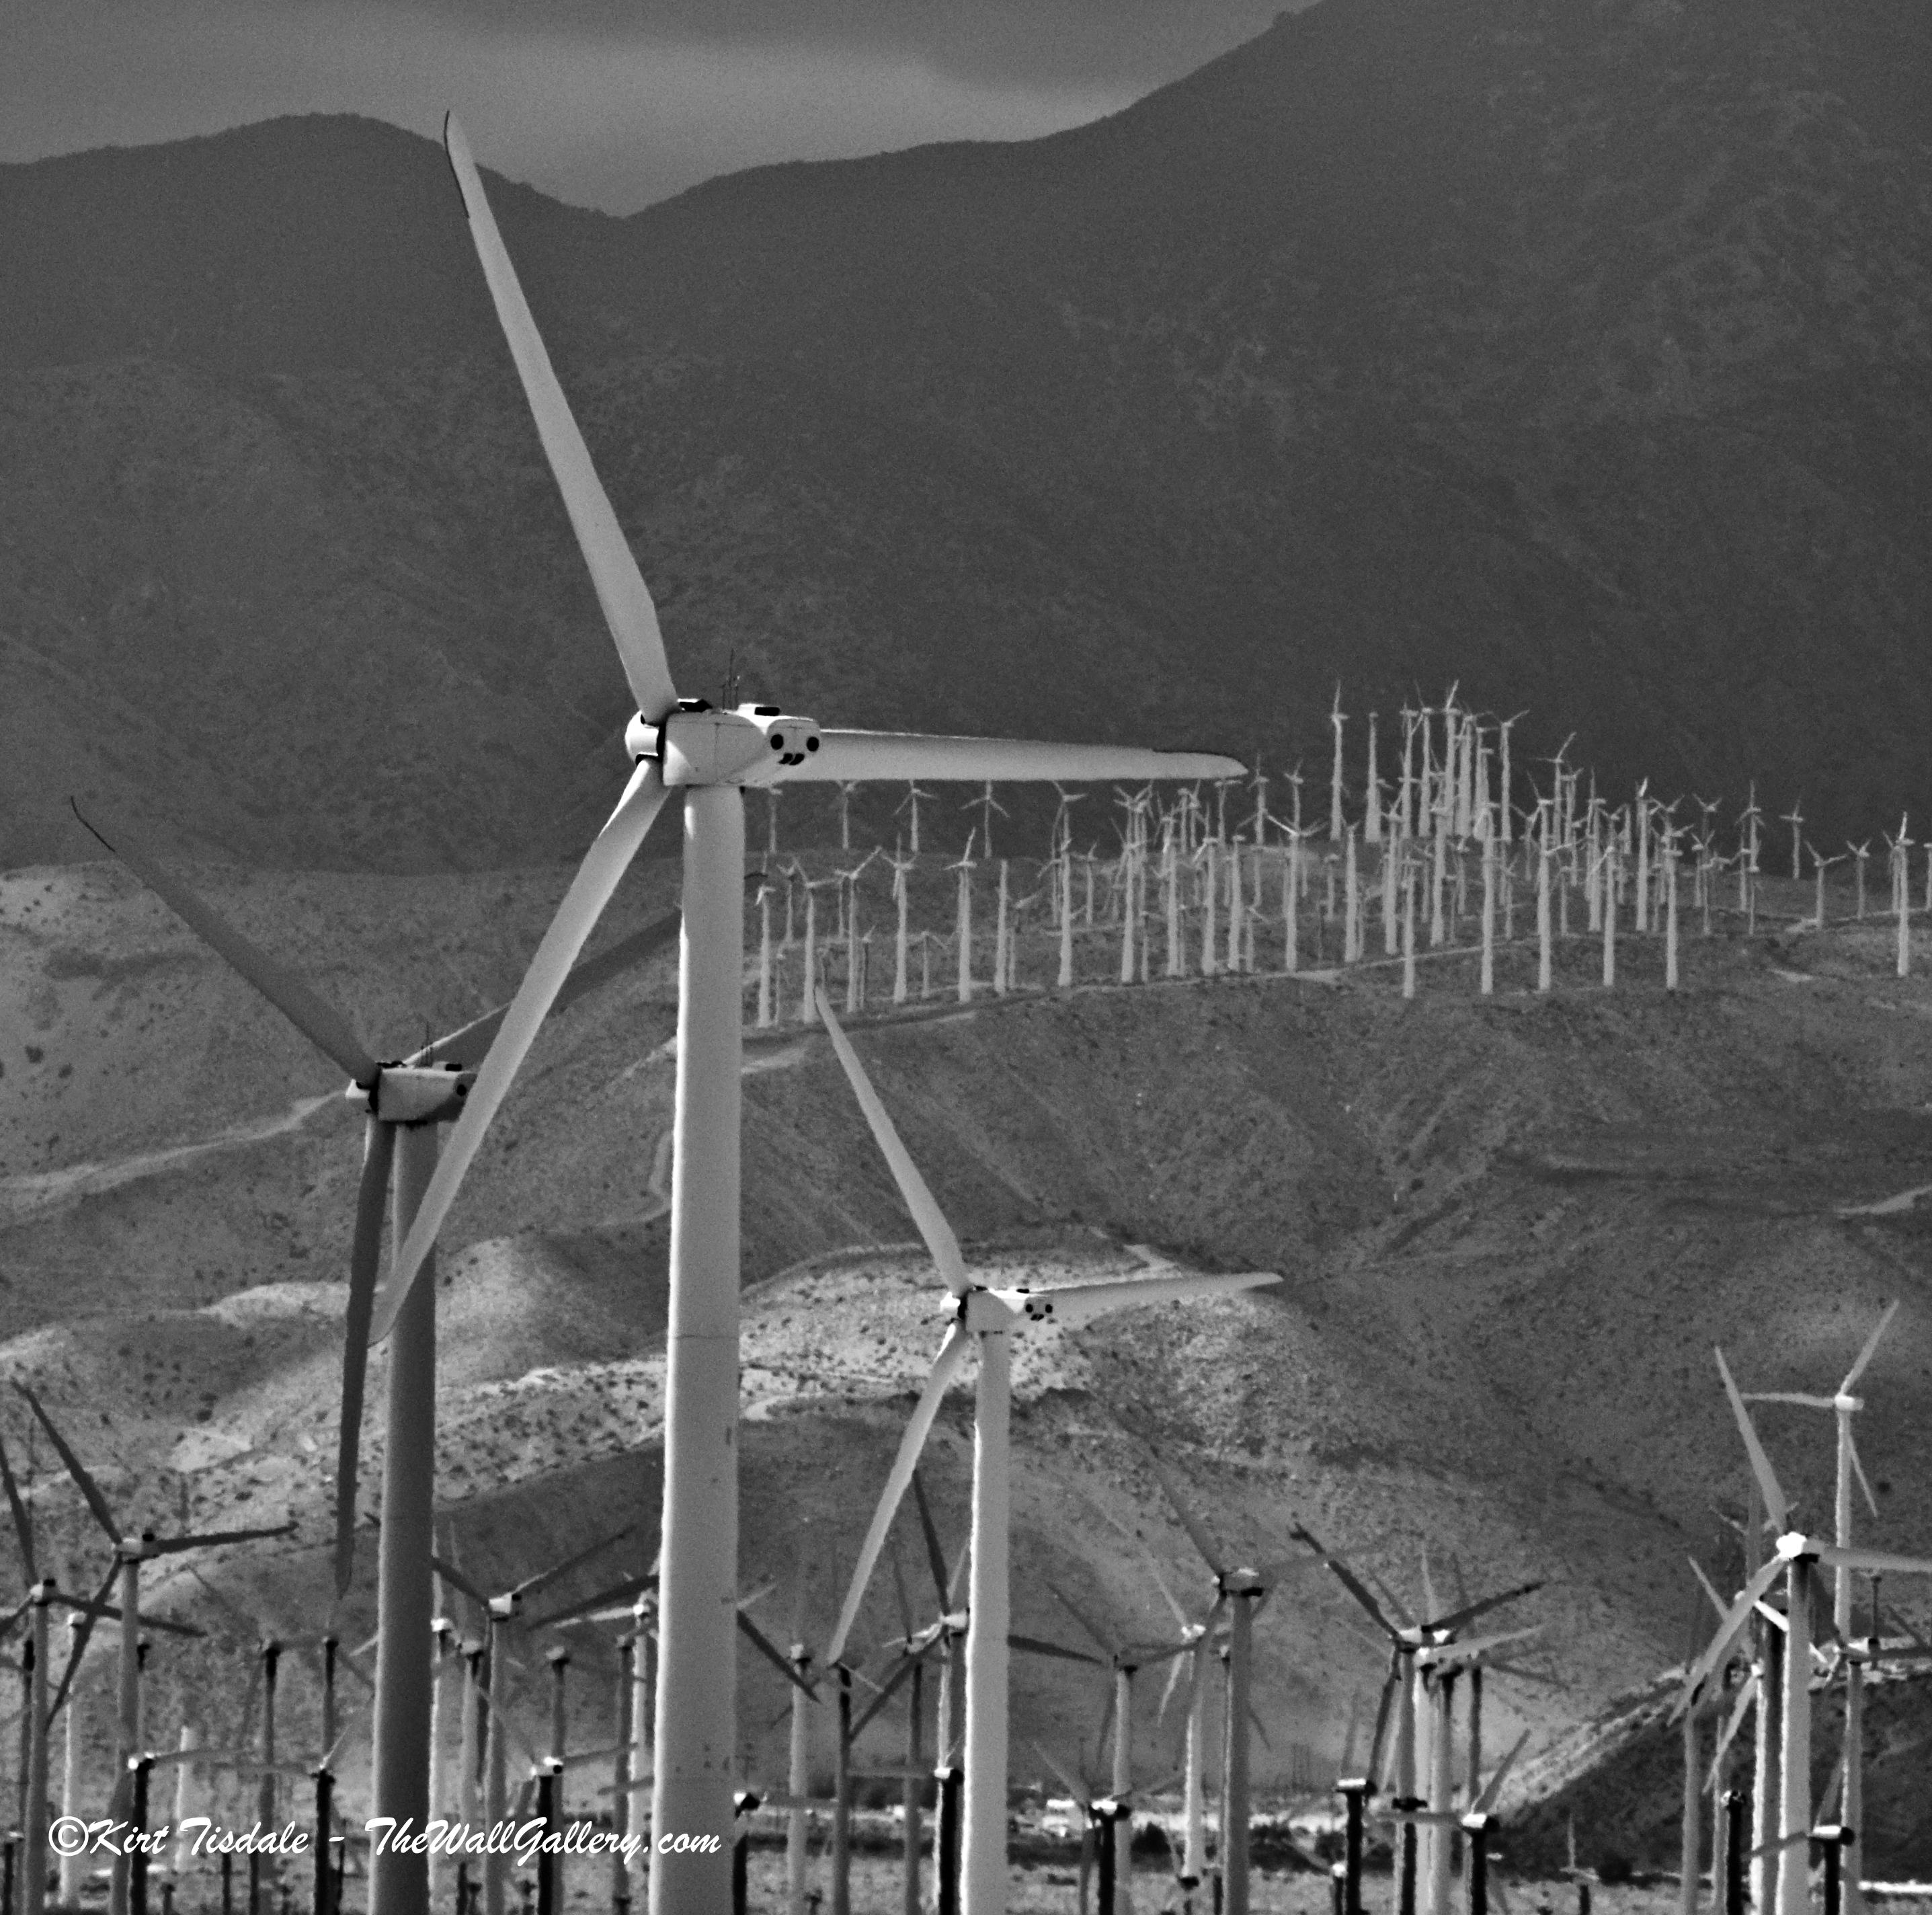 Wind Turbine 3: Black and White